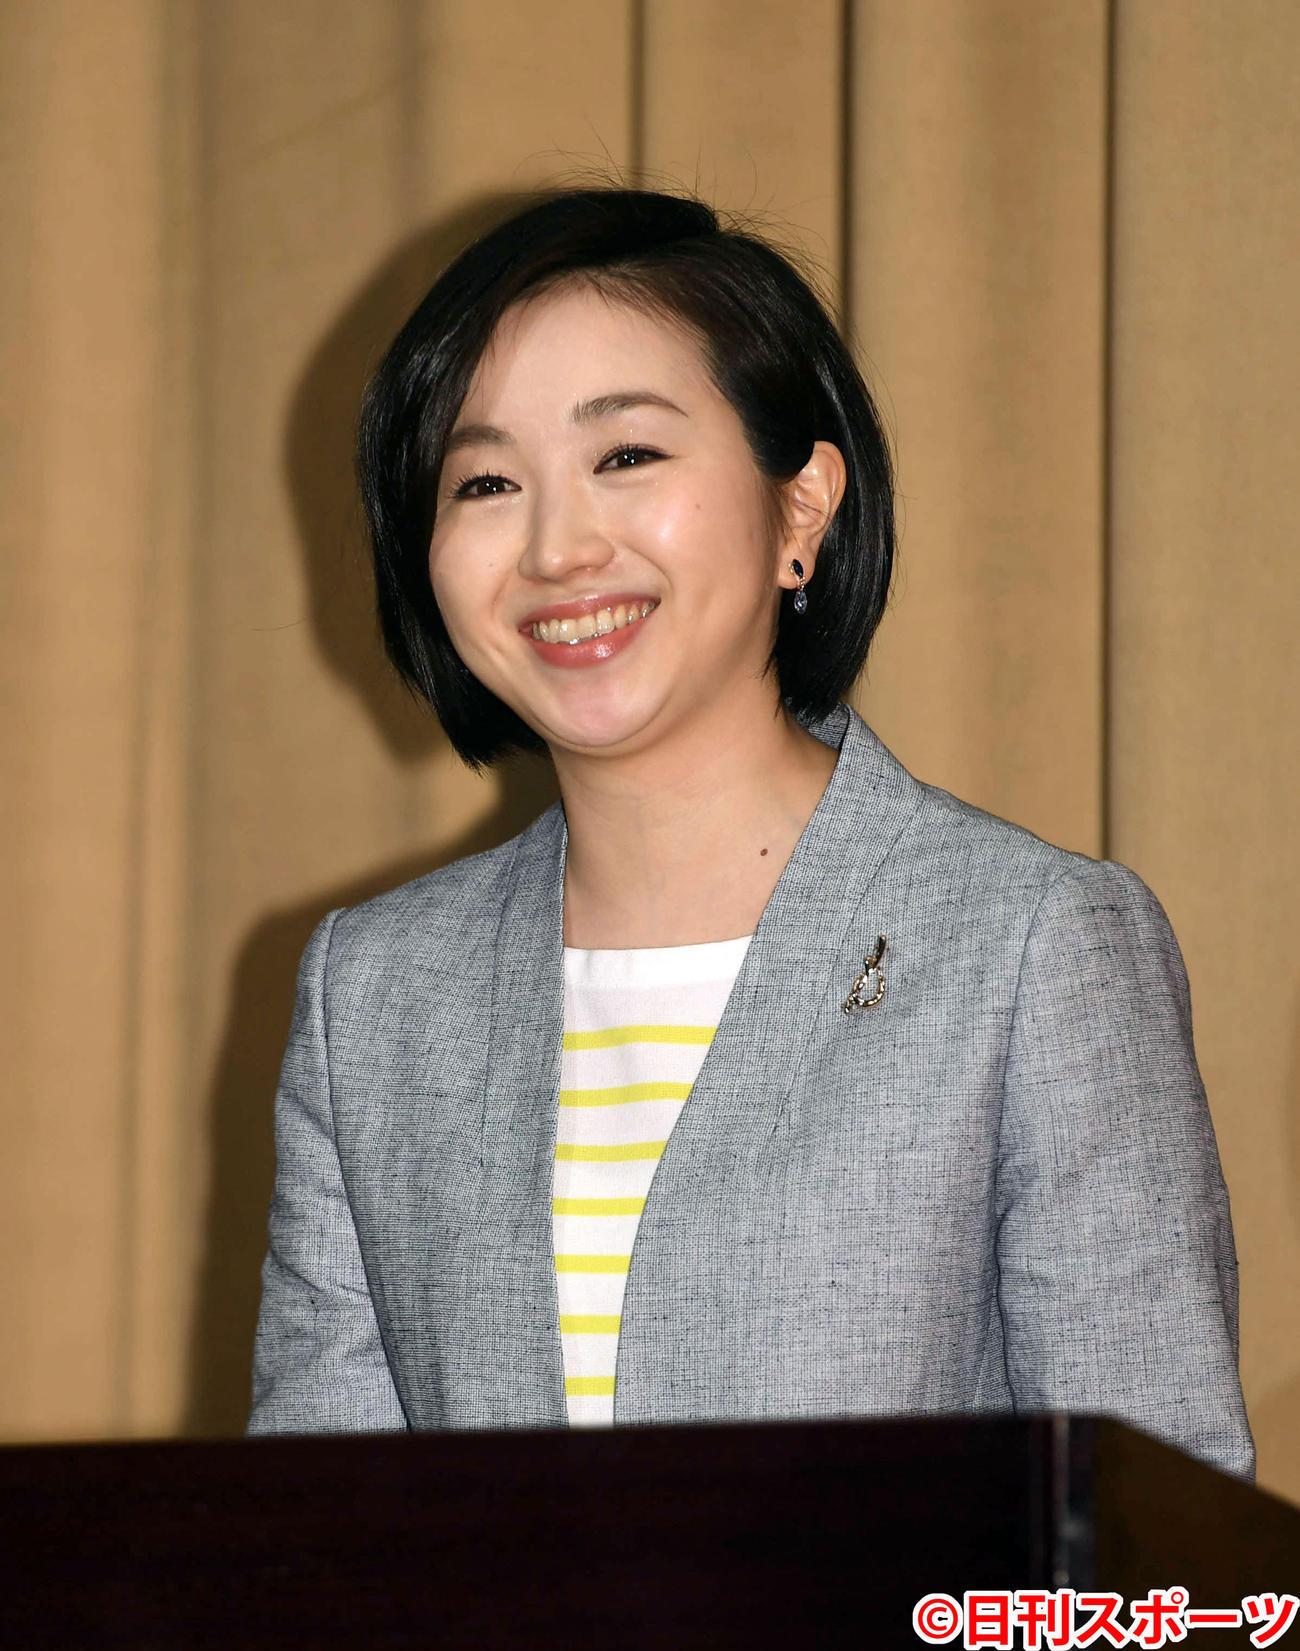 NHK「シブ5時」寺門亜衣子アナ結婚 先輩職員と - 結婚・熱愛 : 日刊スポーツ